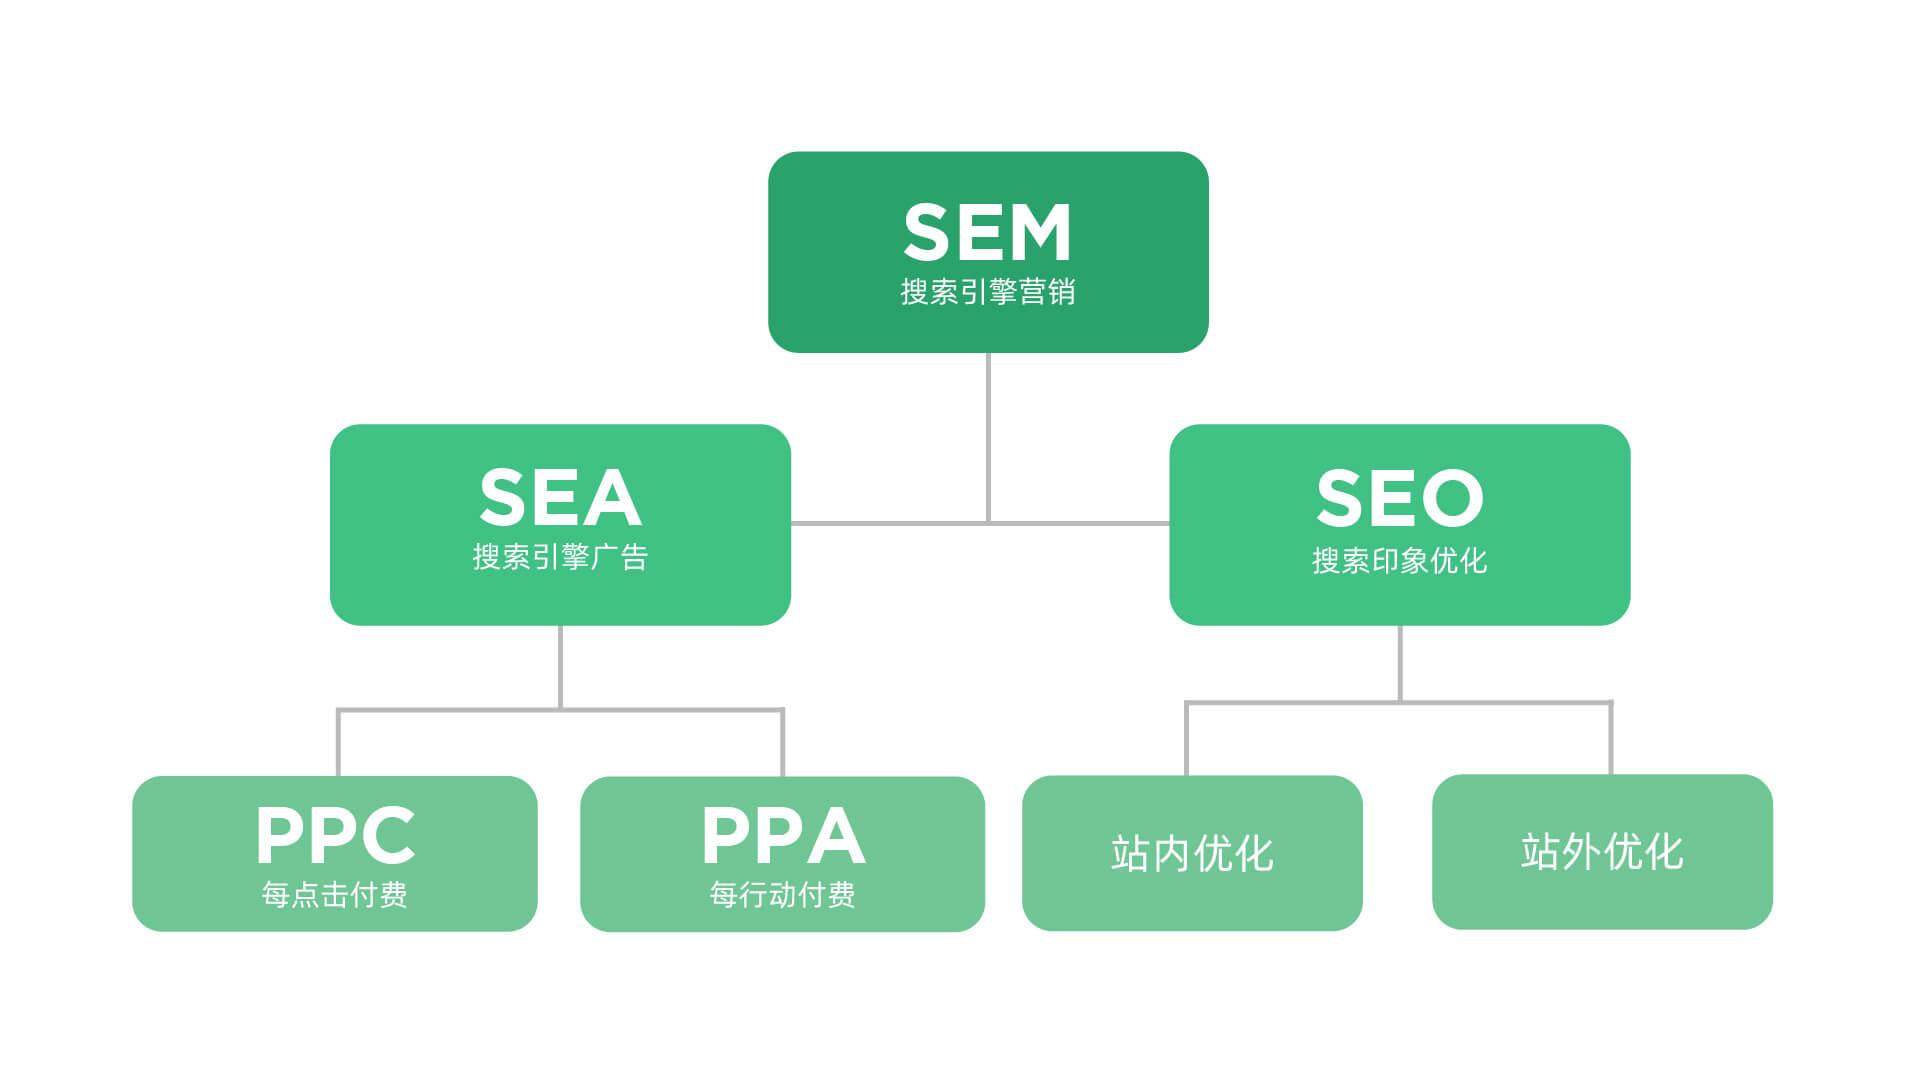 SEM SEA SEO PPC PPA On-site Off-site 搜索引擎优化 帮助网站排名 by MOOC Creative目刻创意